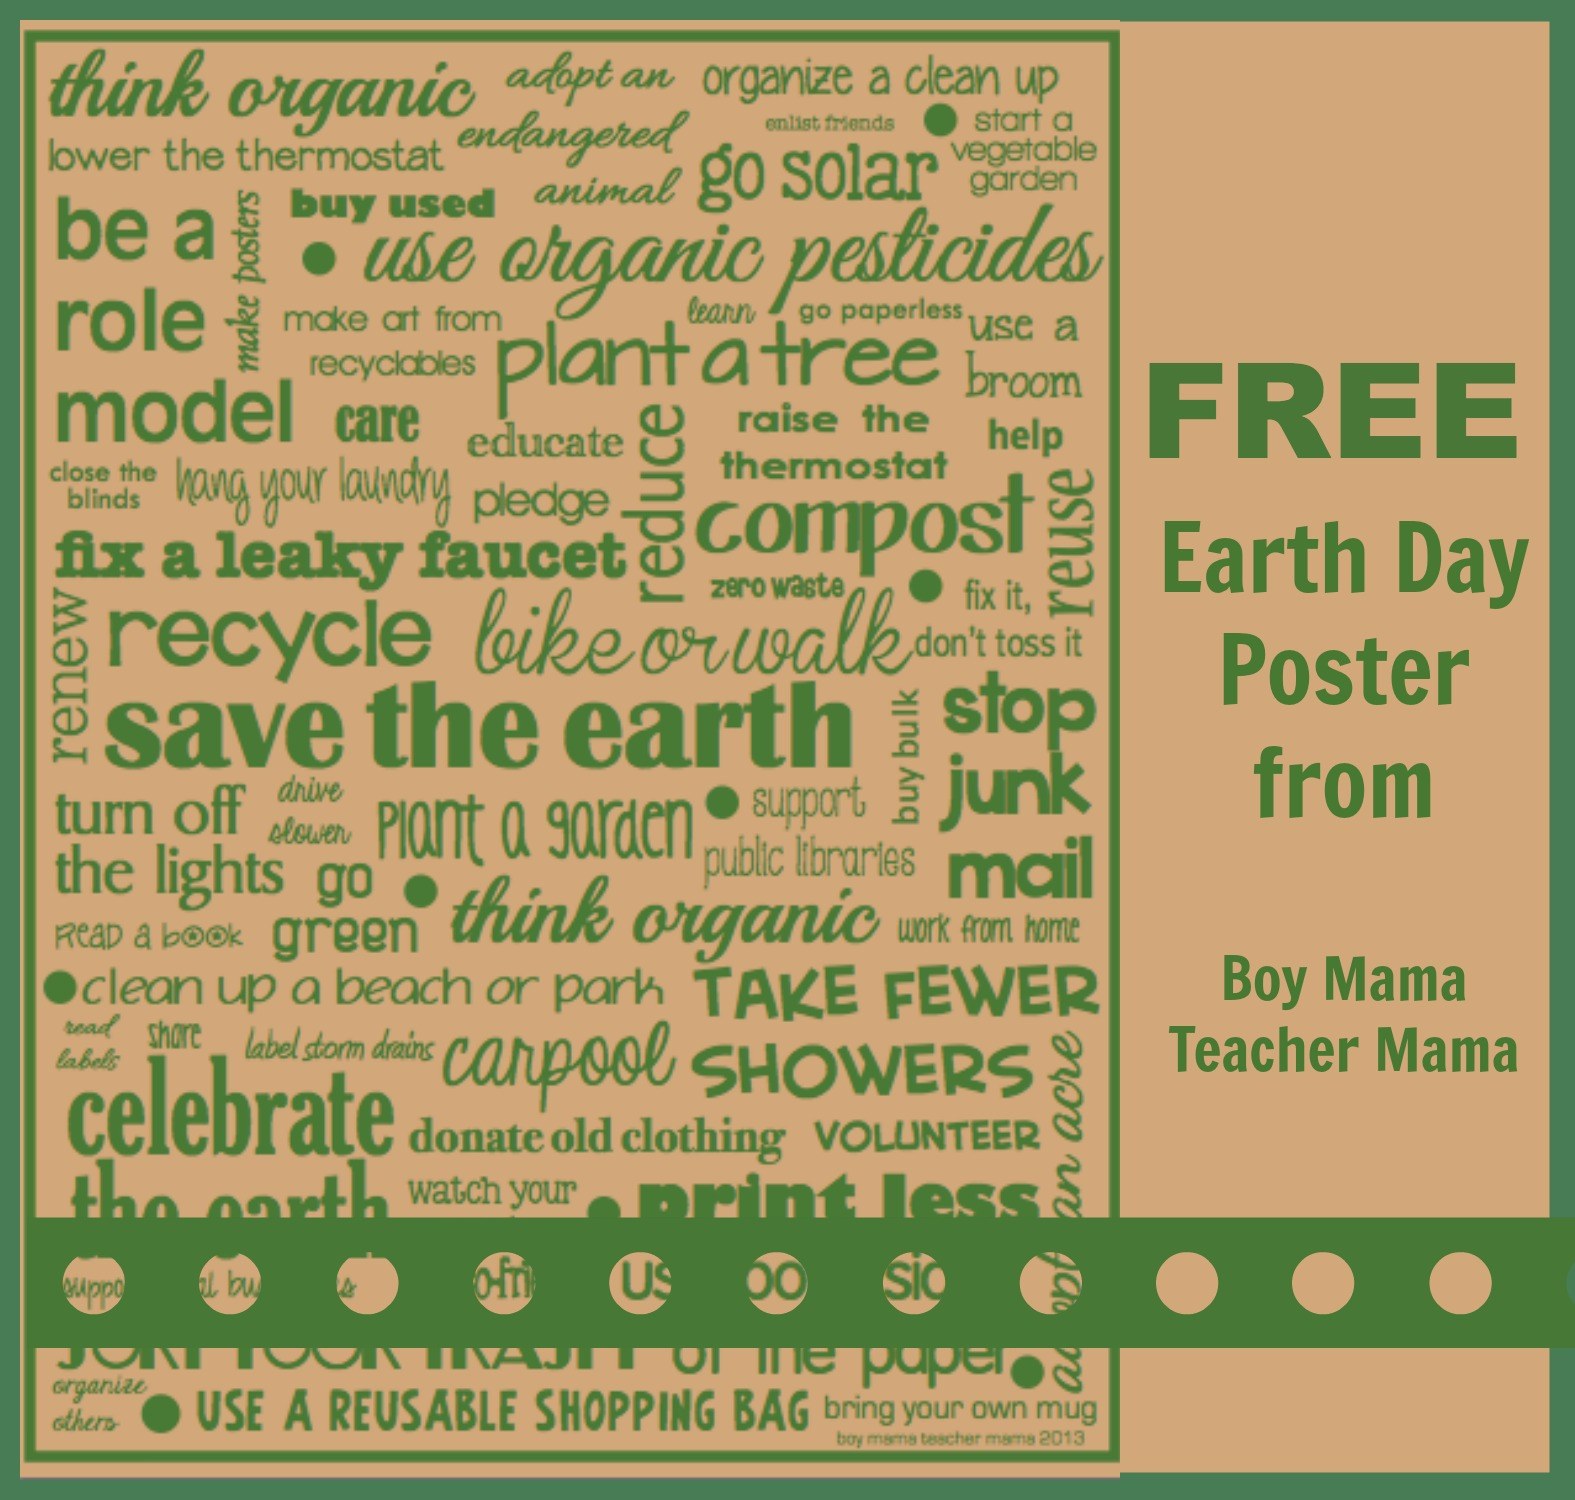 Boy Mama Teacher Free Earth Day Poster